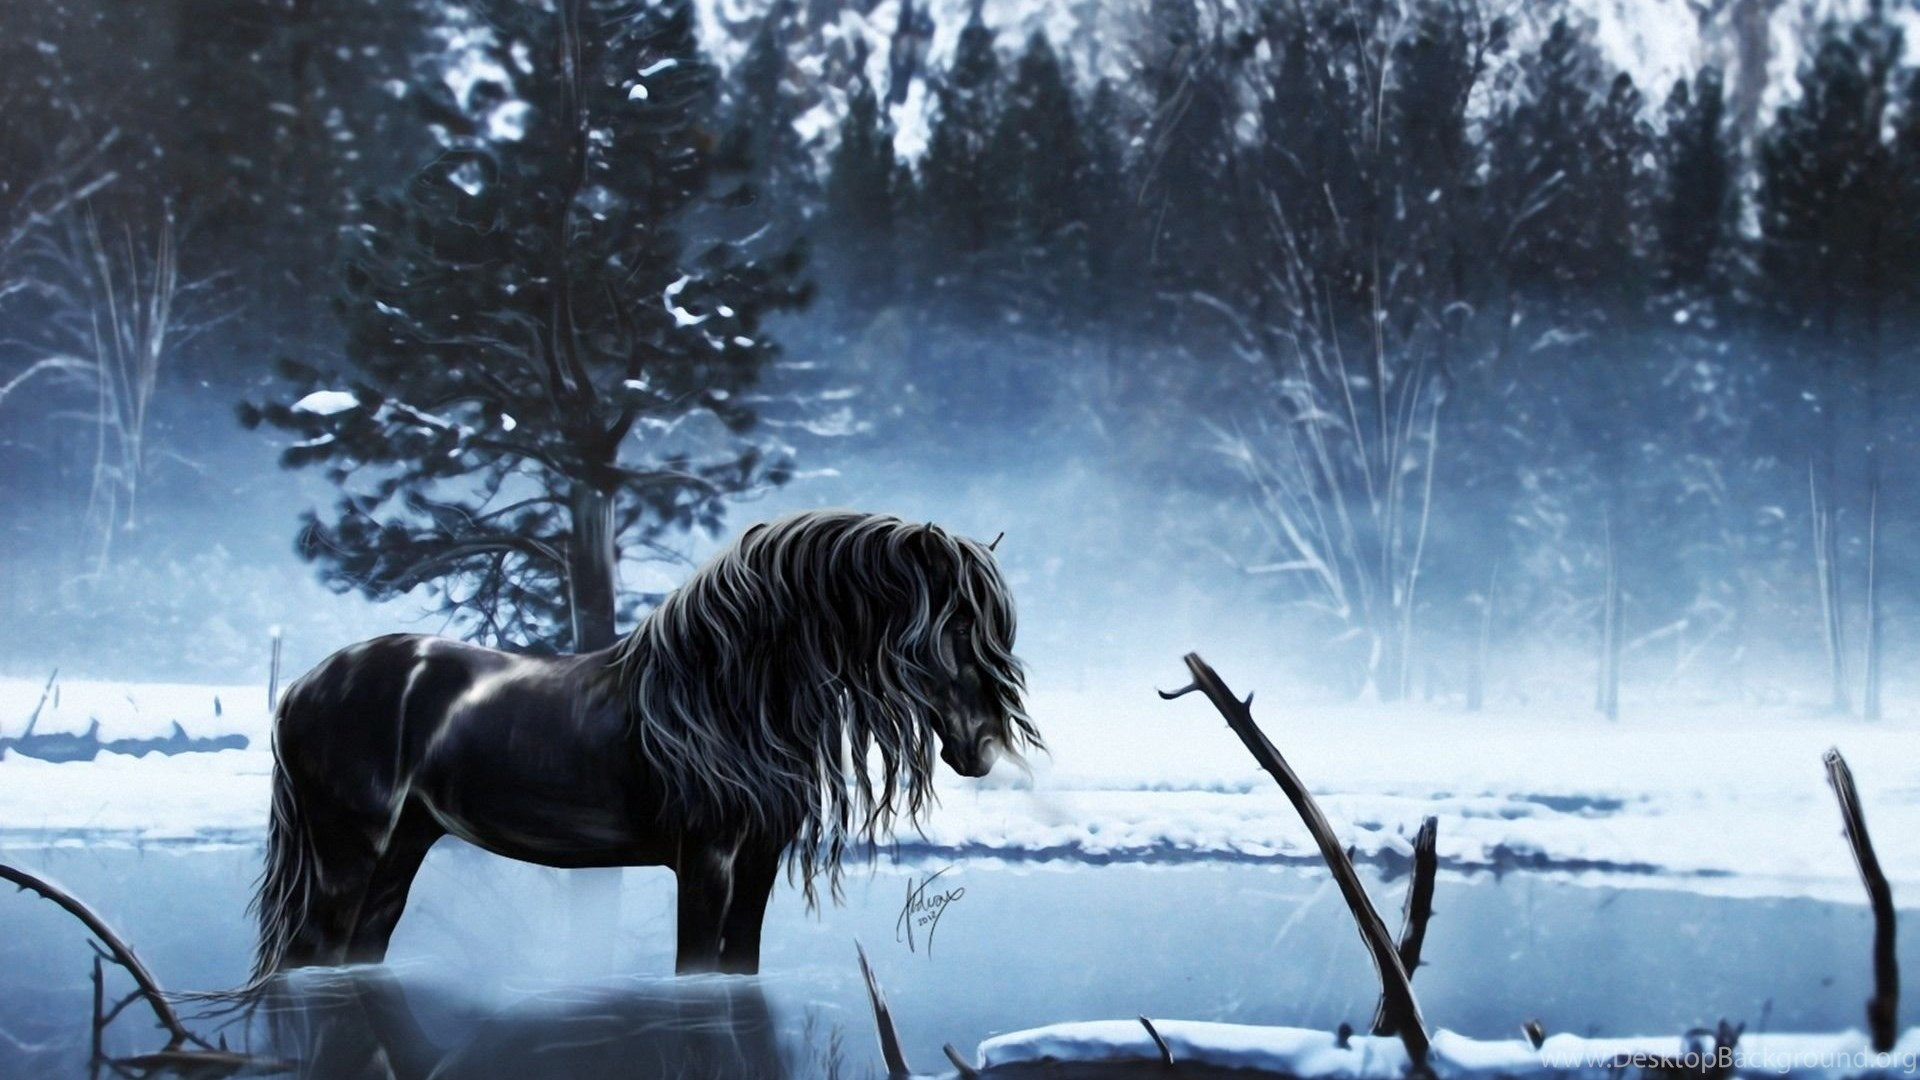 Horses Fantasy Horse Animal Water Horses Art Winter Wallpapers Desktop Background